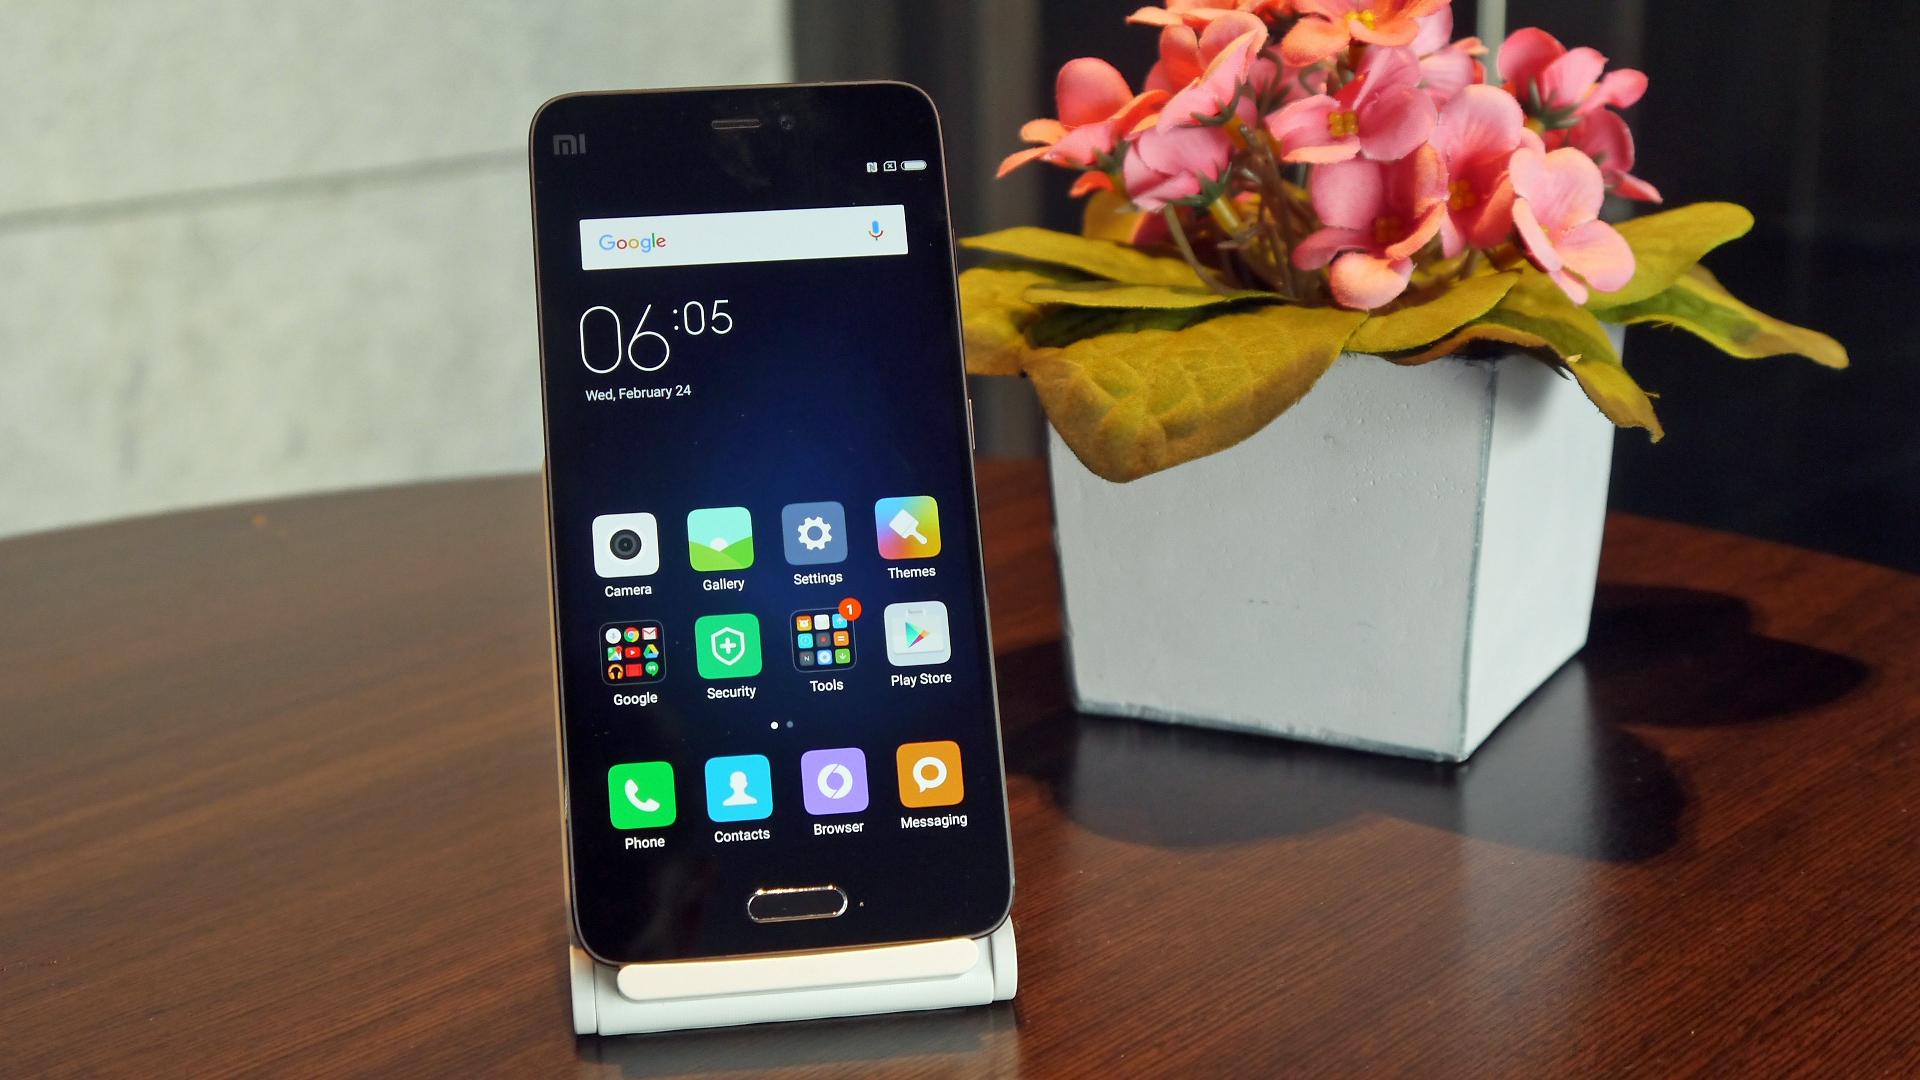 Permalink to Spesifikasi Xiaomi Redmi 5 Plus Ulasan